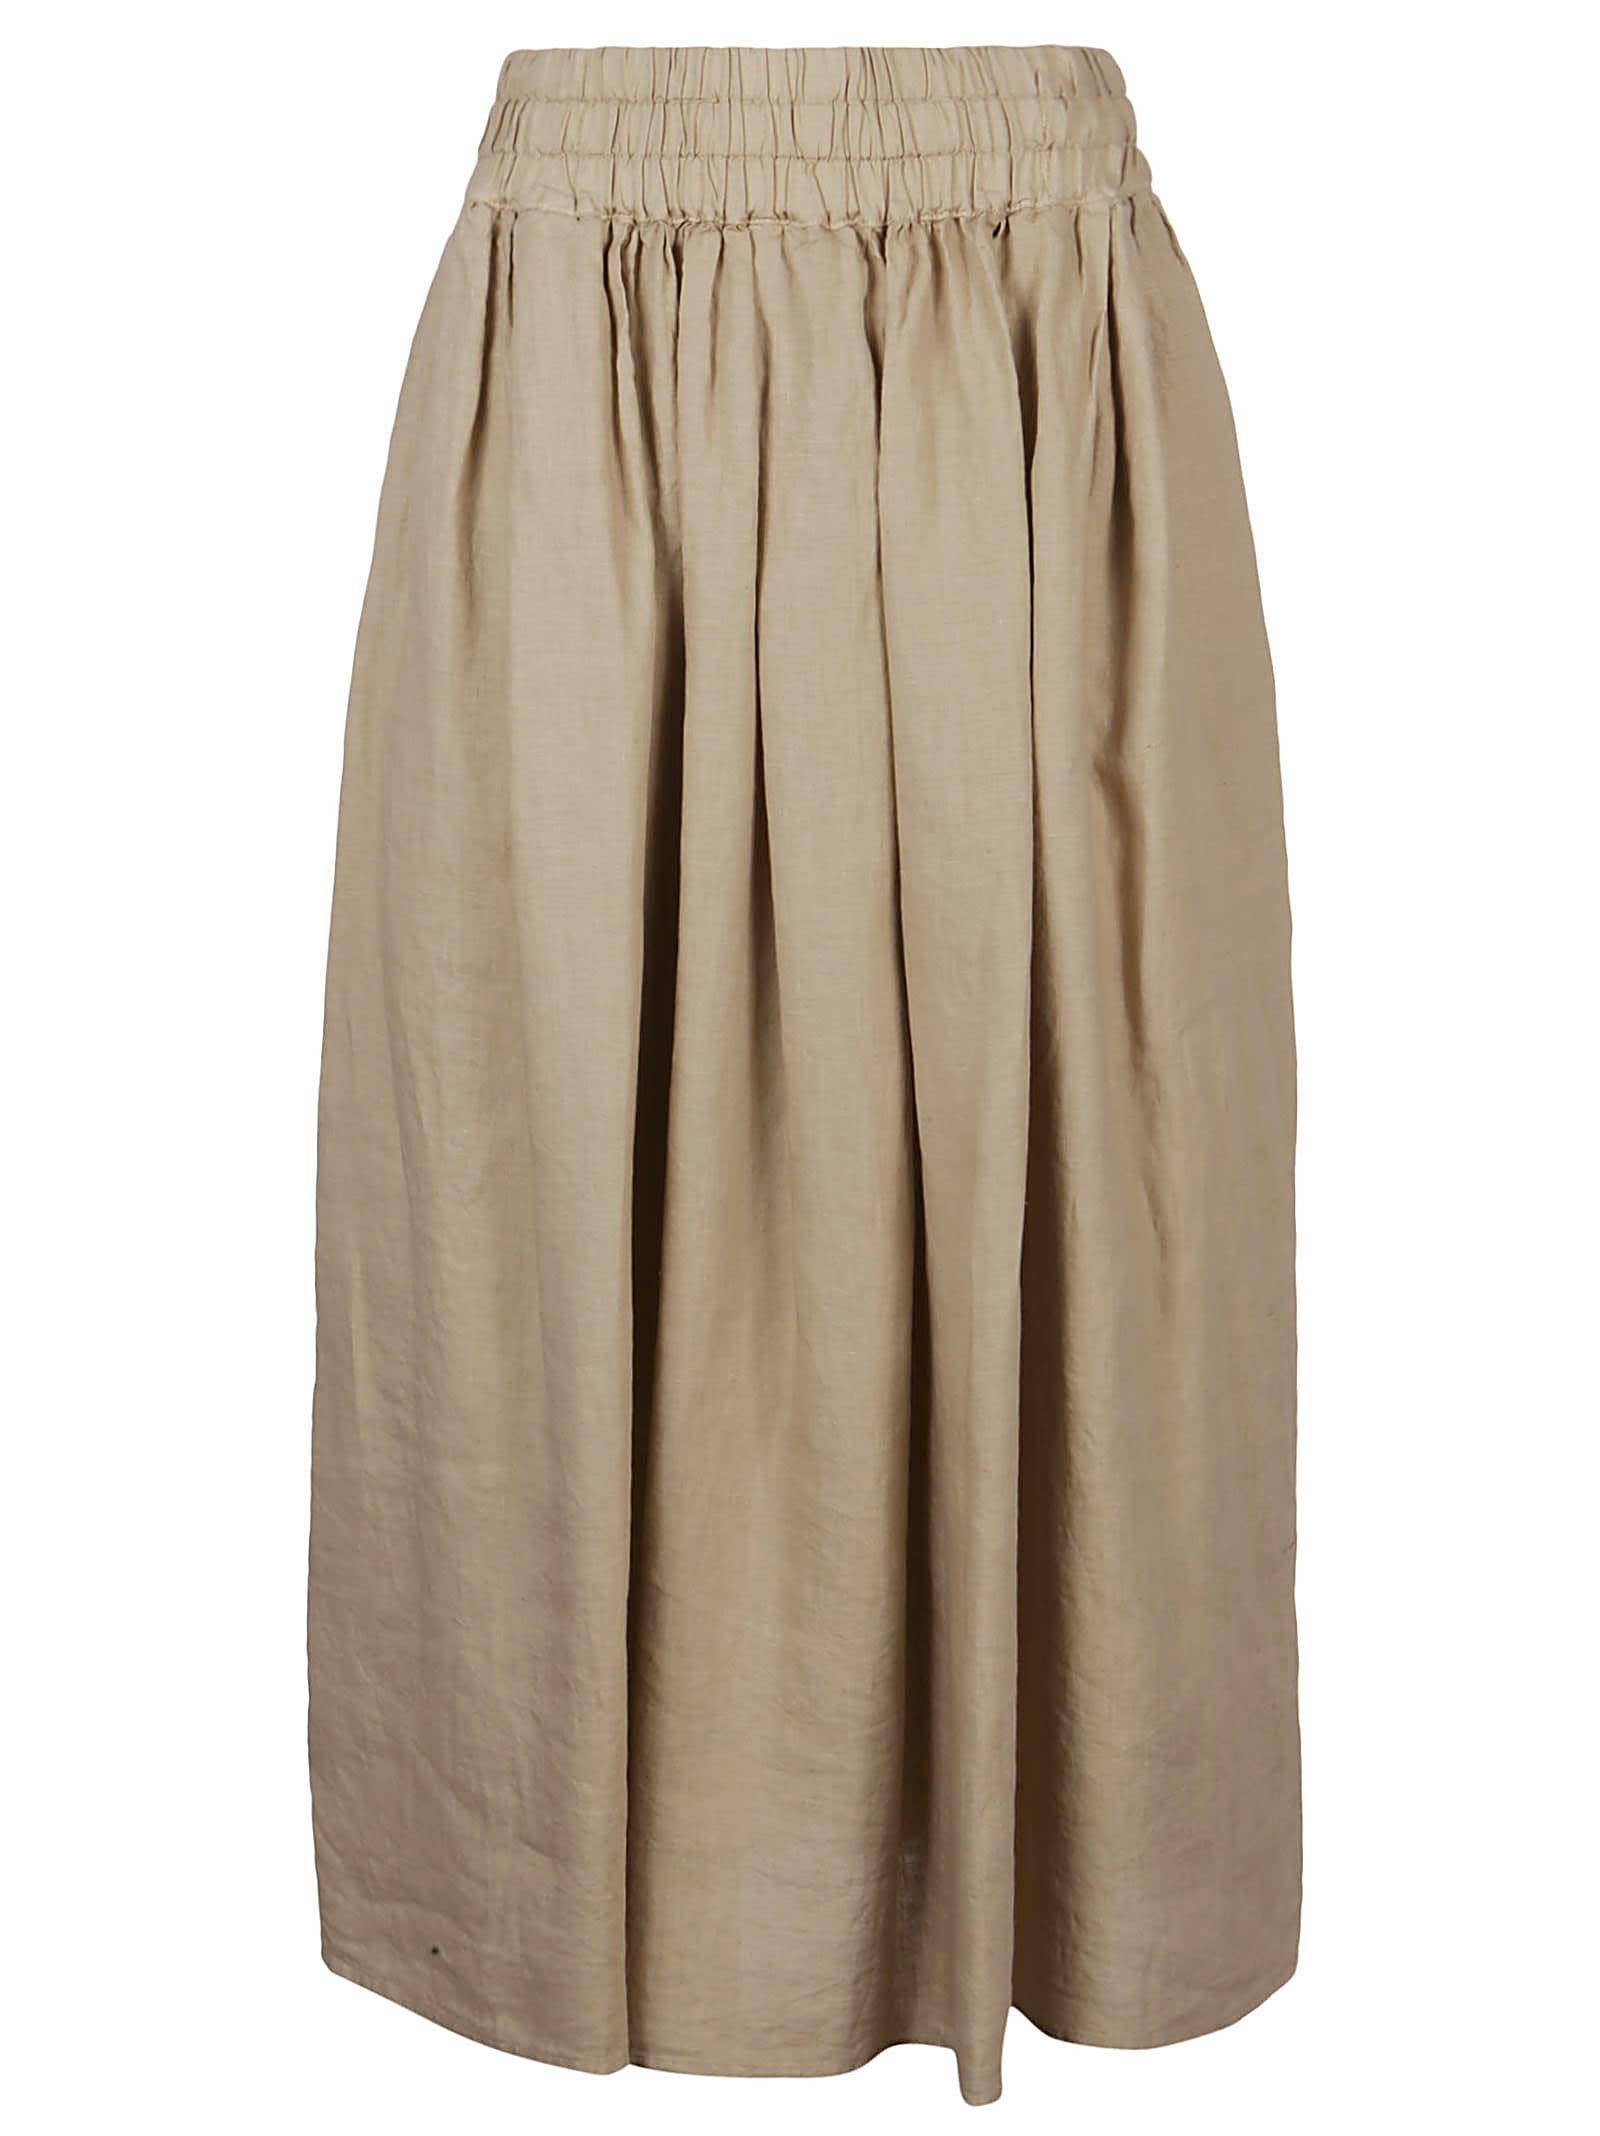 Aspesi High-waist Plain Skirt